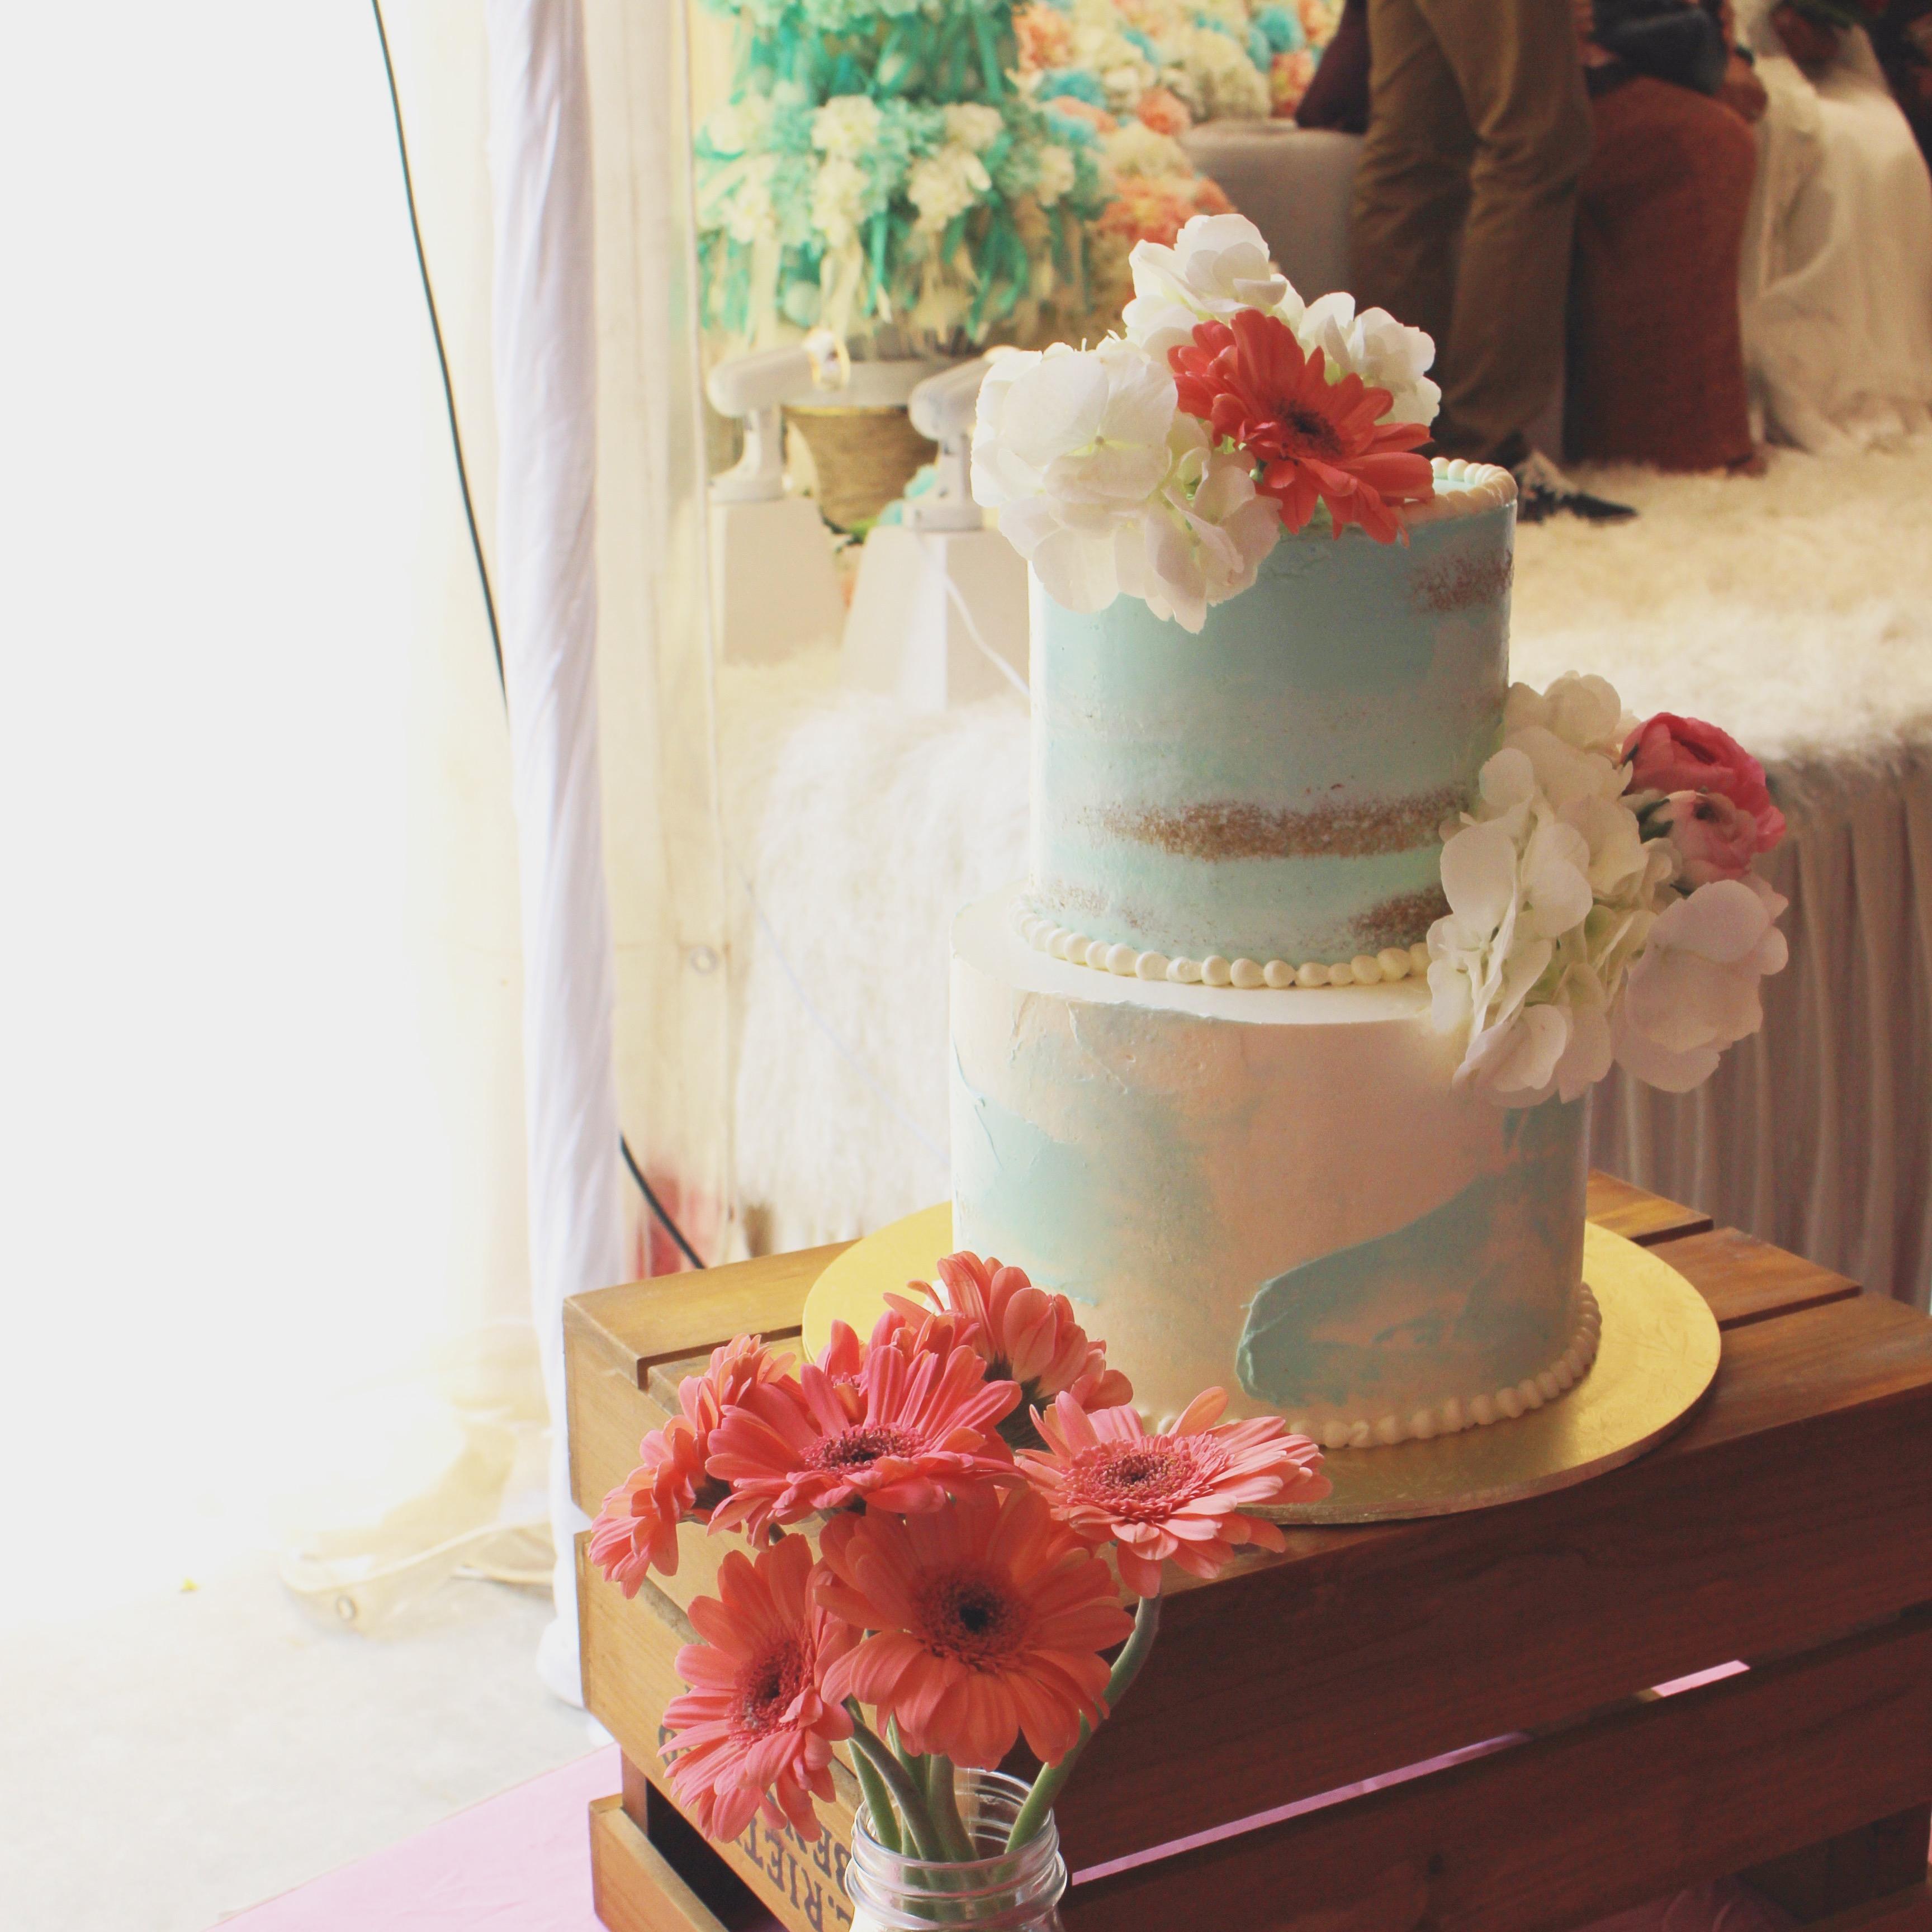 2-Tier Coral Theme Wedding Cake